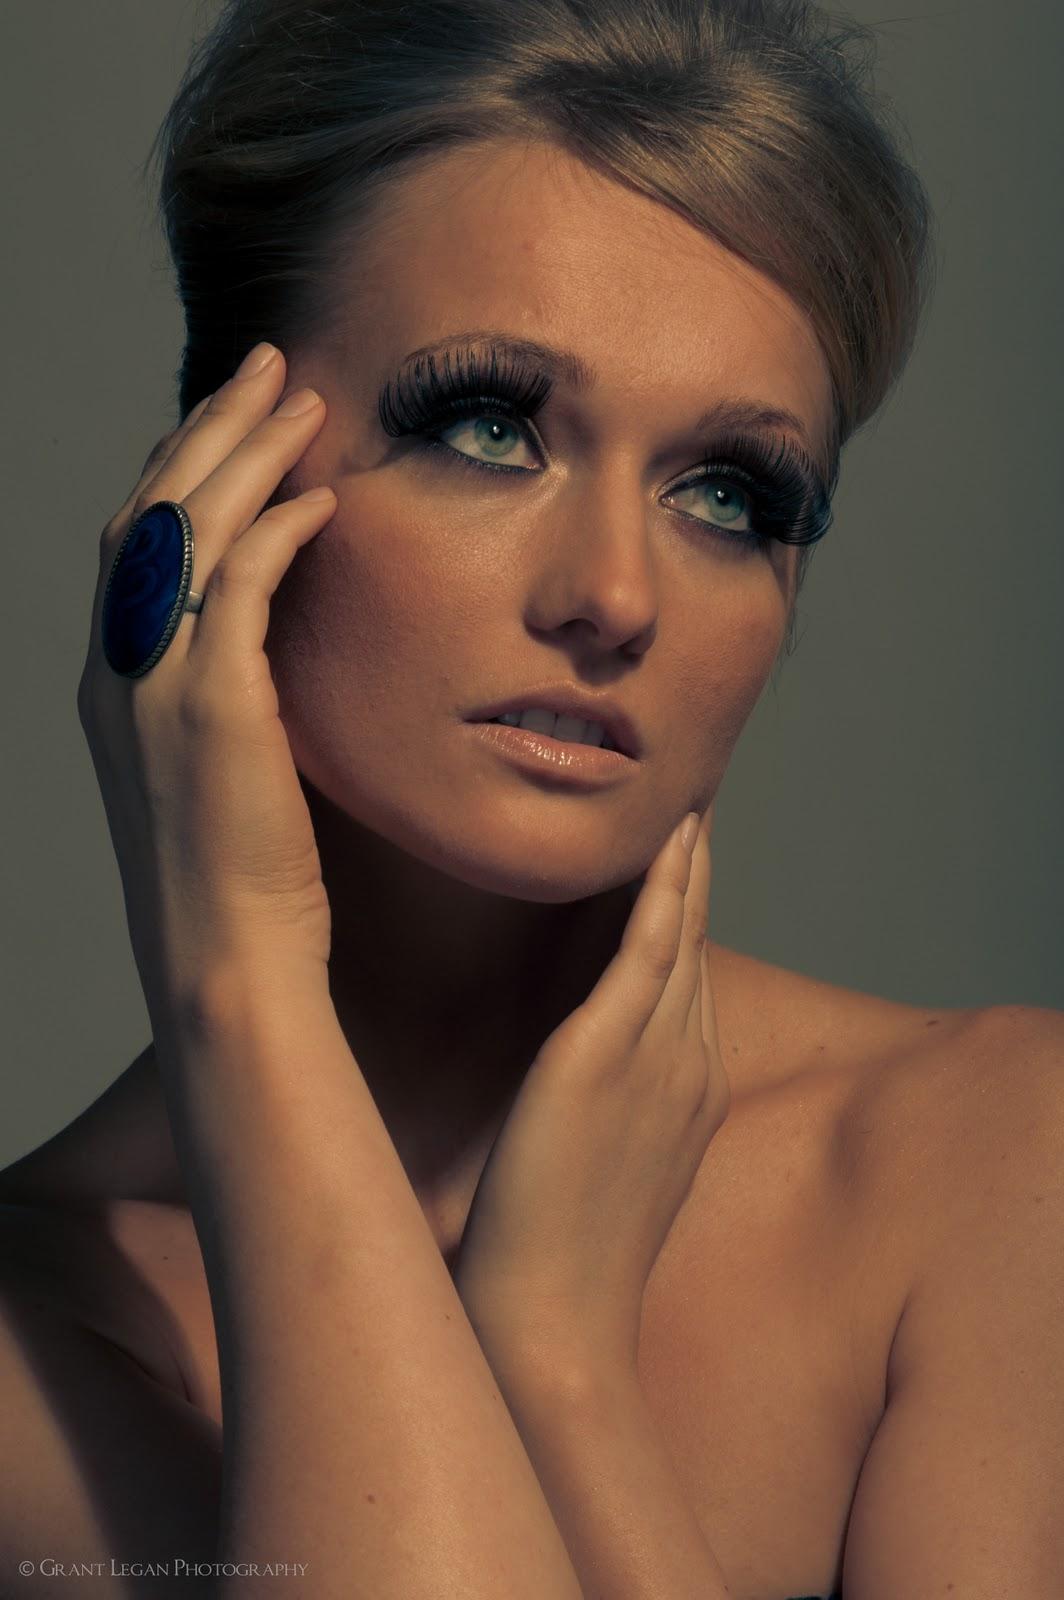 Grant Legan Photography: High Fashion Makeup